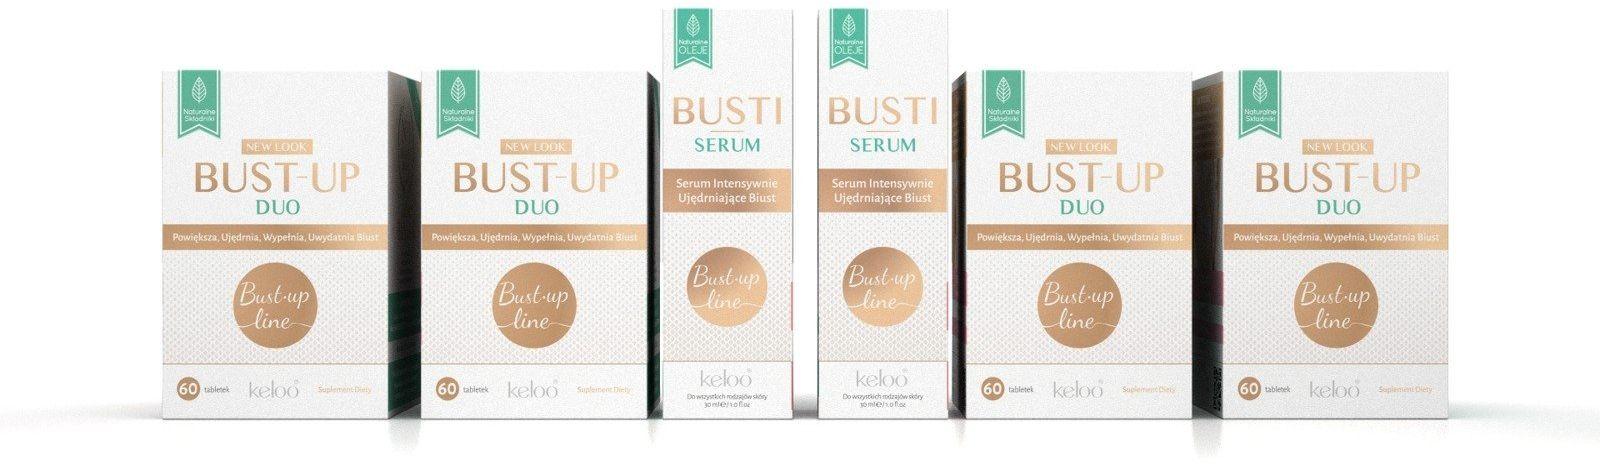 Kuracja 2-miesięczna BUST-UP LINE ( 4 x 60 kapsułek ) + 2 x BUSTI Serum 30 ml